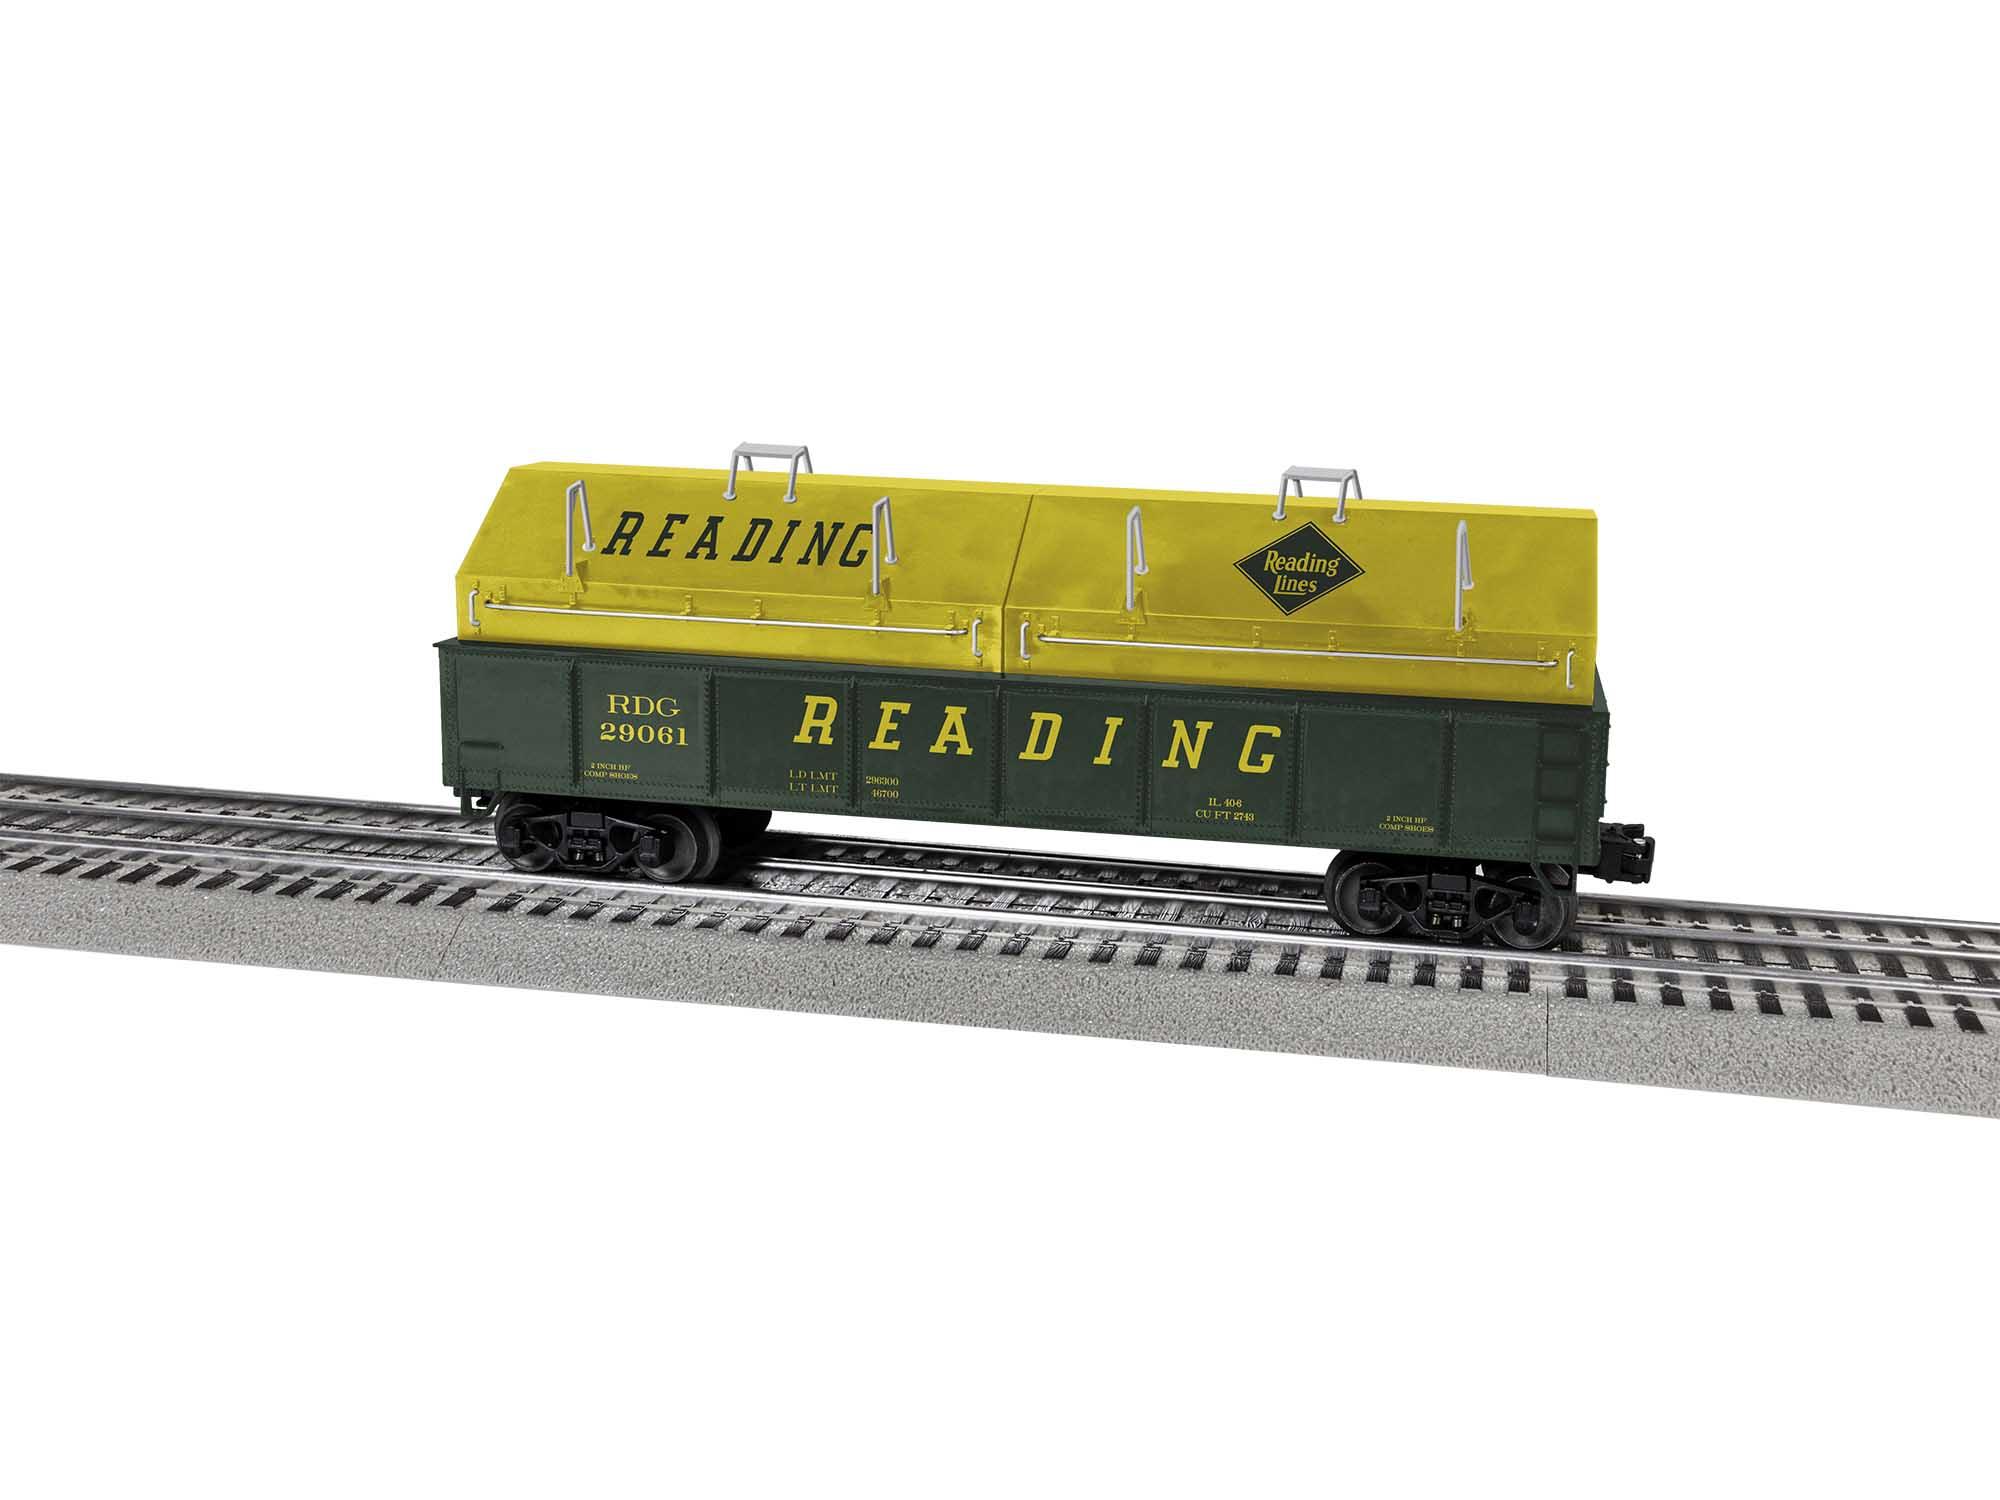 Lionel 2043161 O Gondola Reading RDG #29061